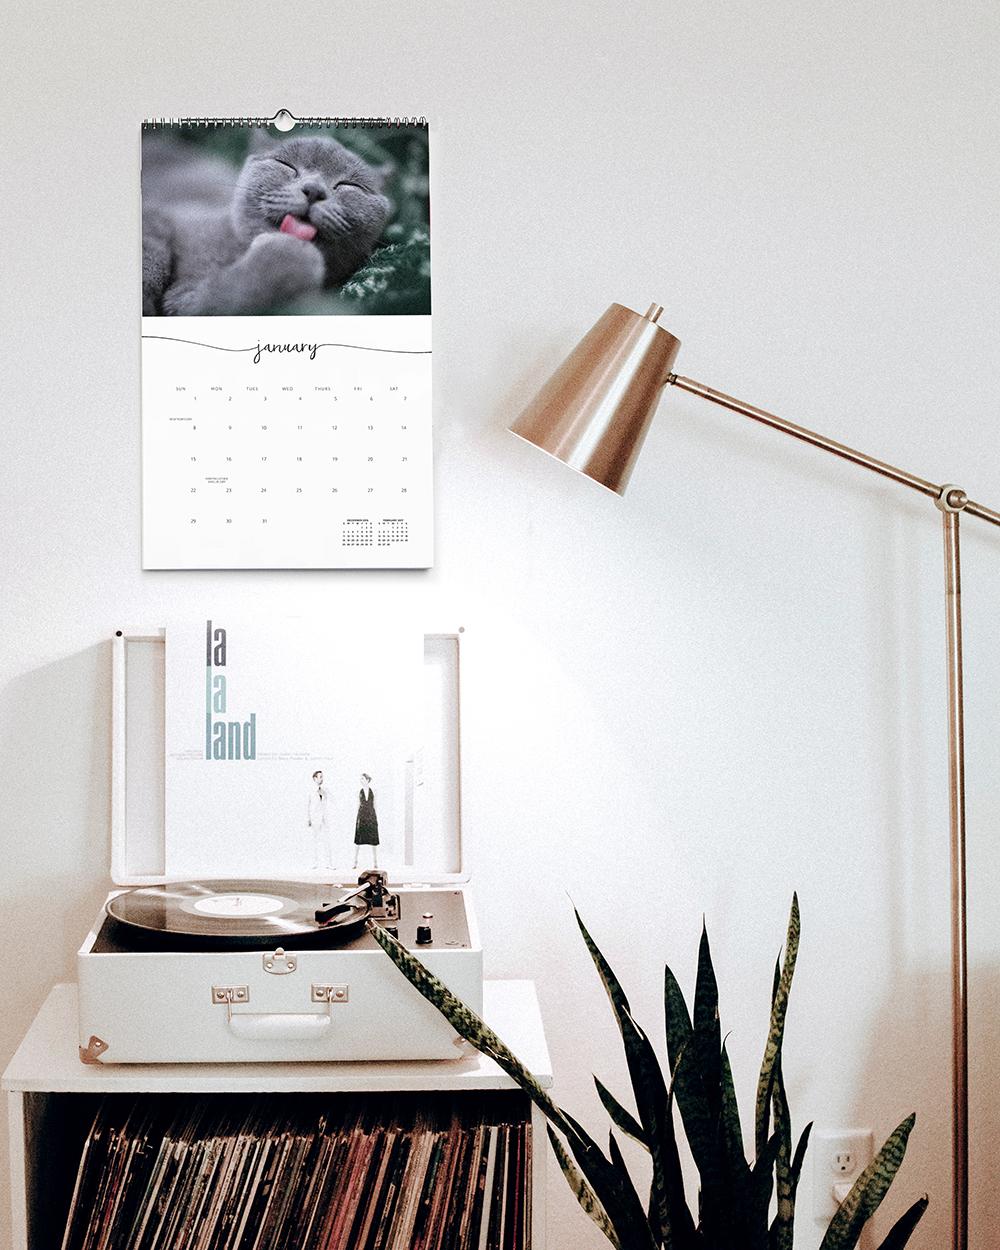 Custom photo calendar above record player